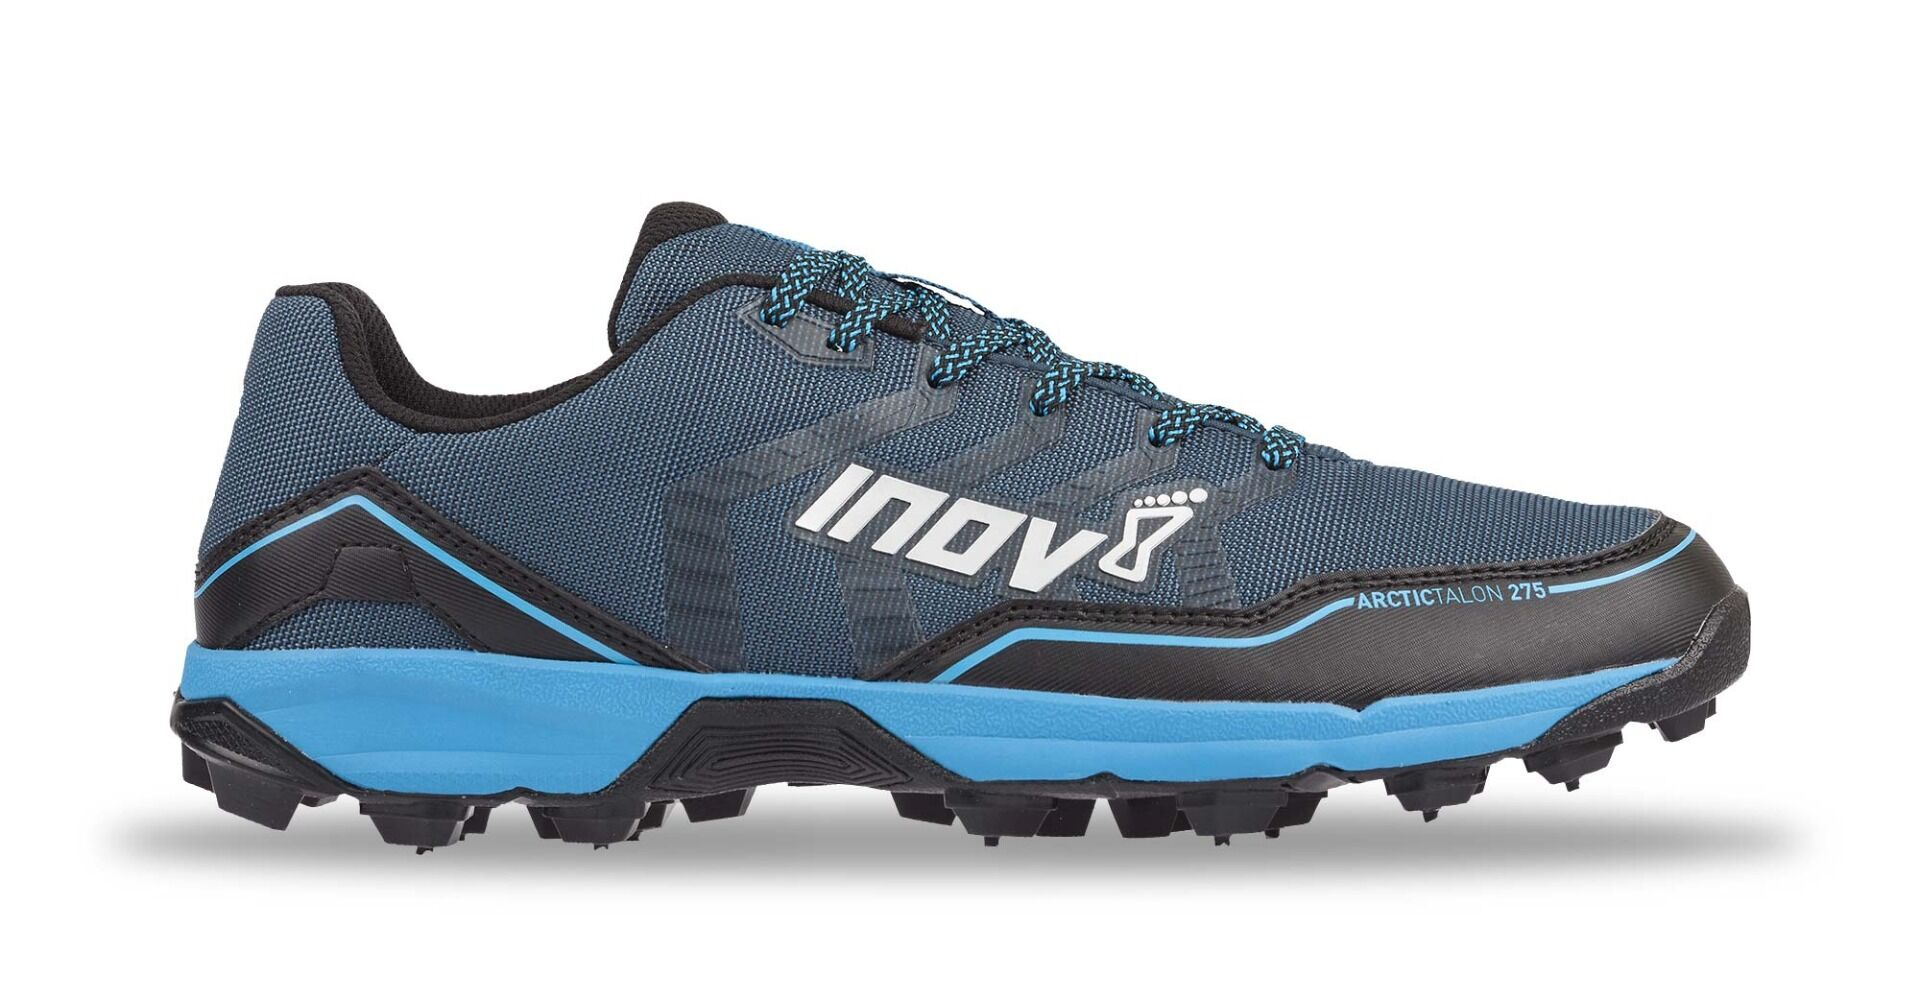 Arctictalon 275 Men's Running Shoe | inov-8